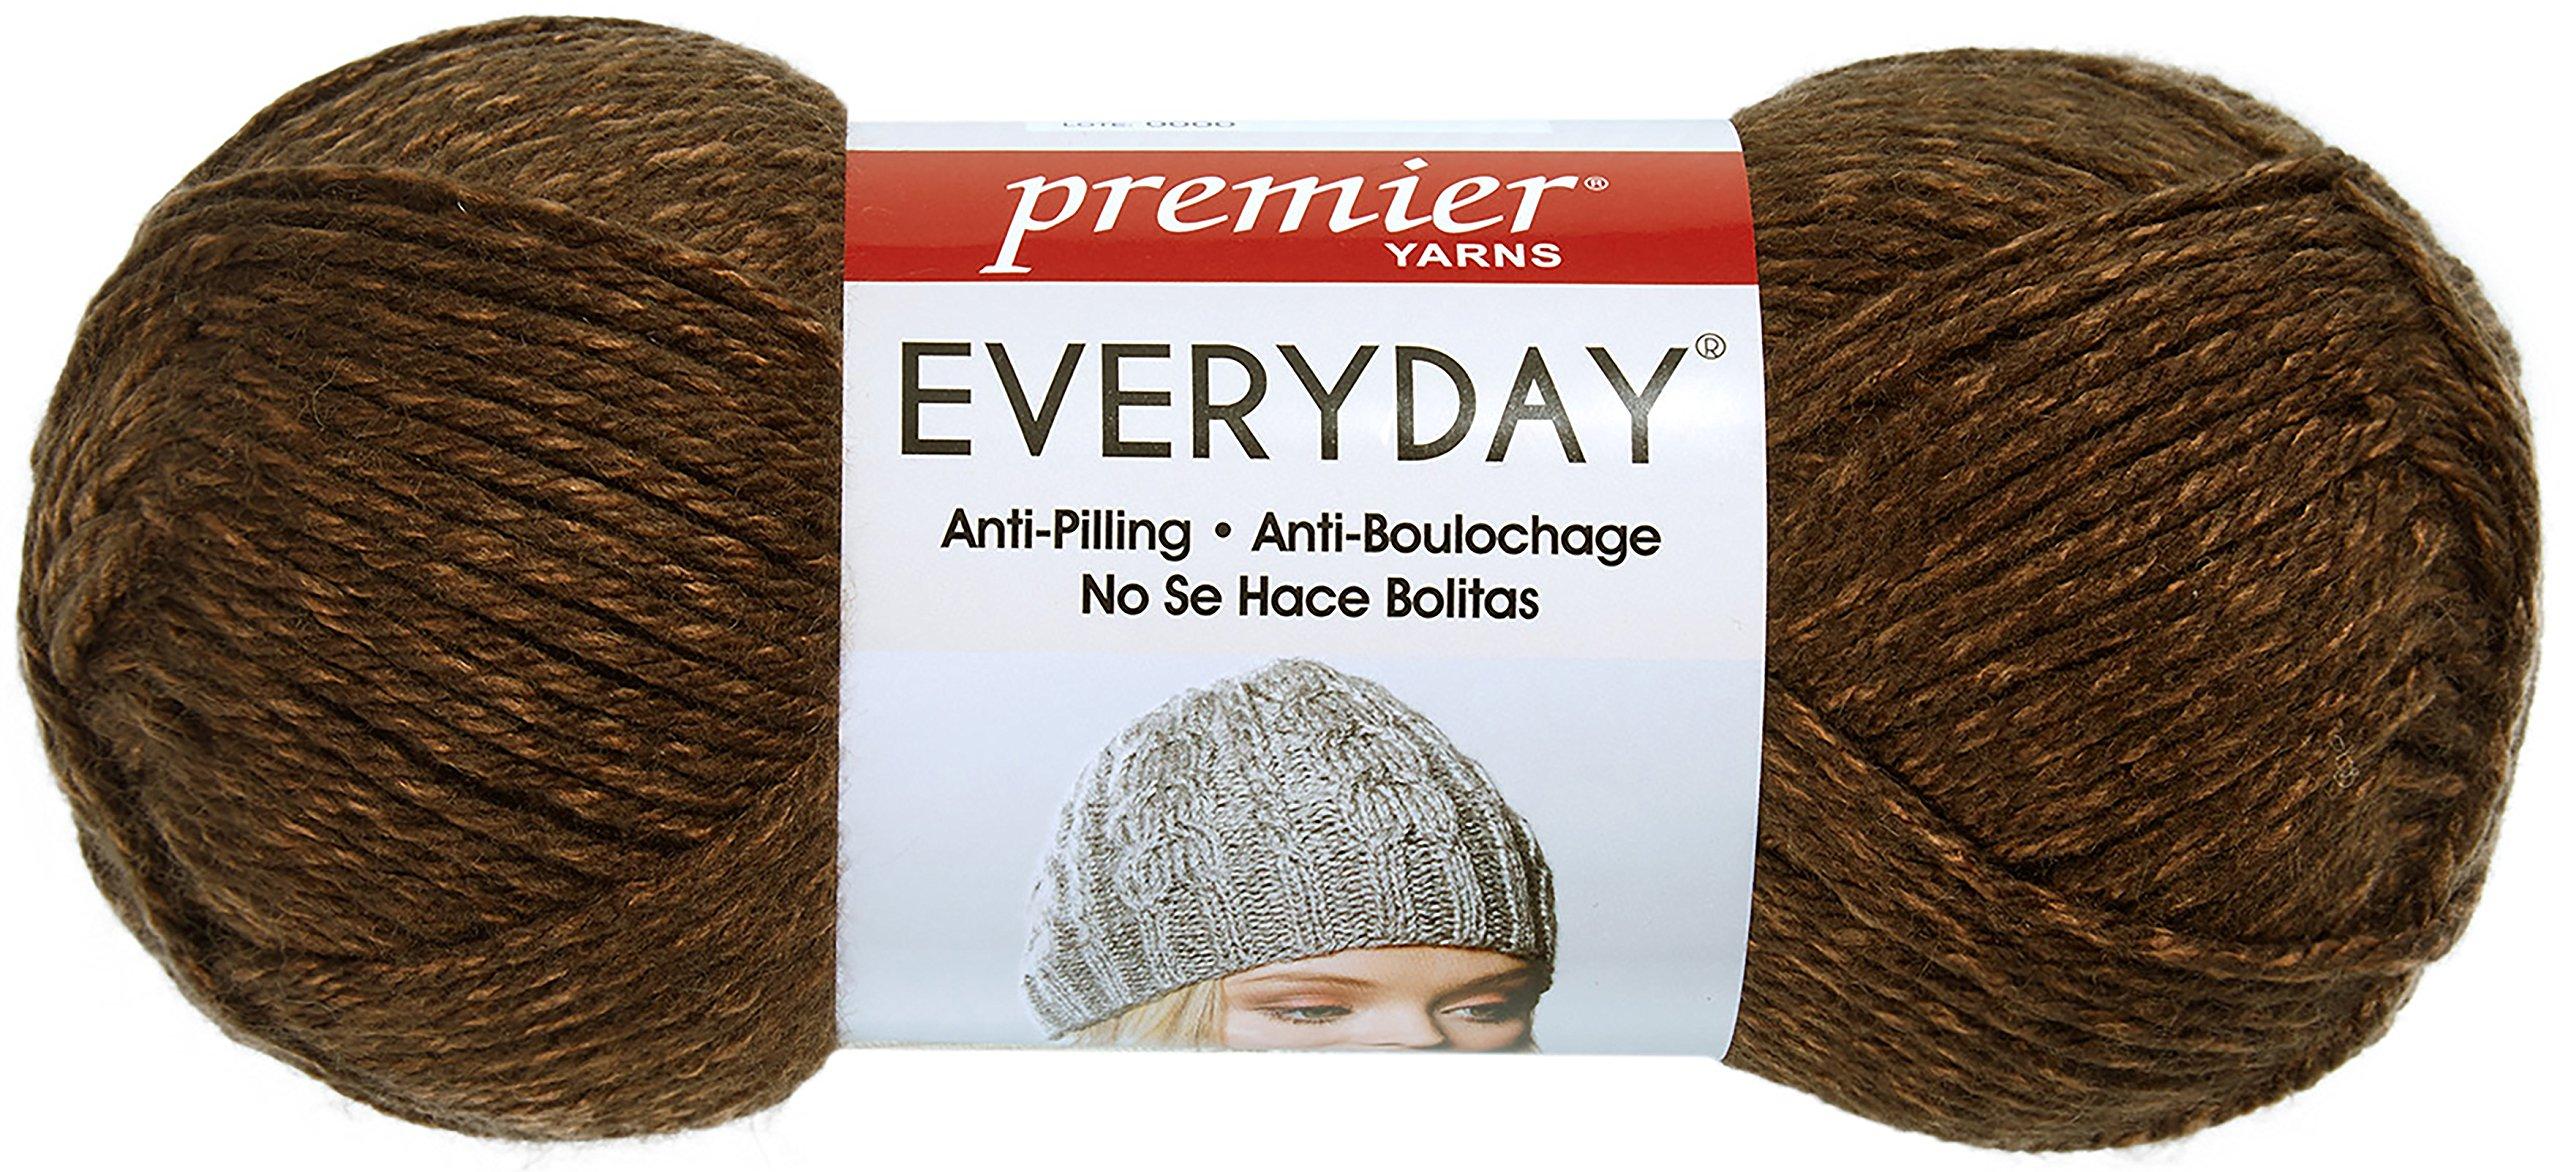 Premier Yarns 110-07 Everyday Soft Worsted Heather Yarn-Cocoa by Premier Yarns (Image #1)